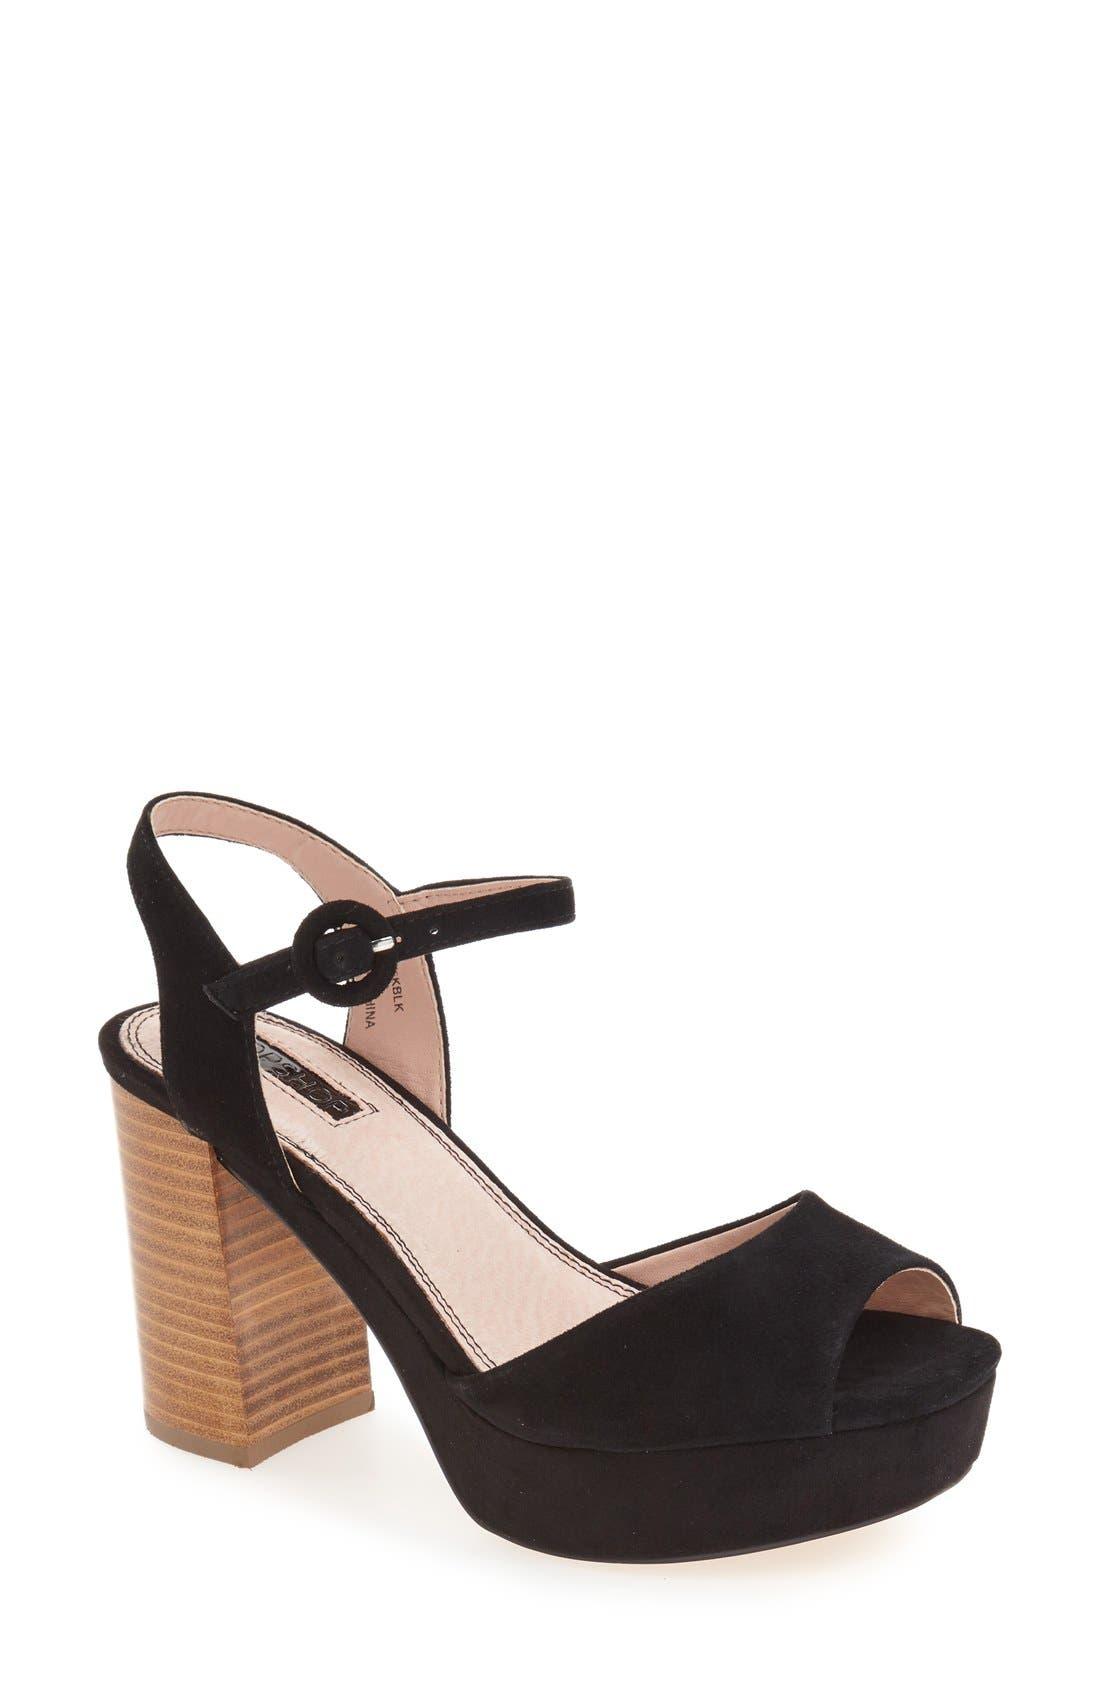 Alternate Image 1 Selected - Topshop 'Lana' Chunky Platform Sandal (Women)